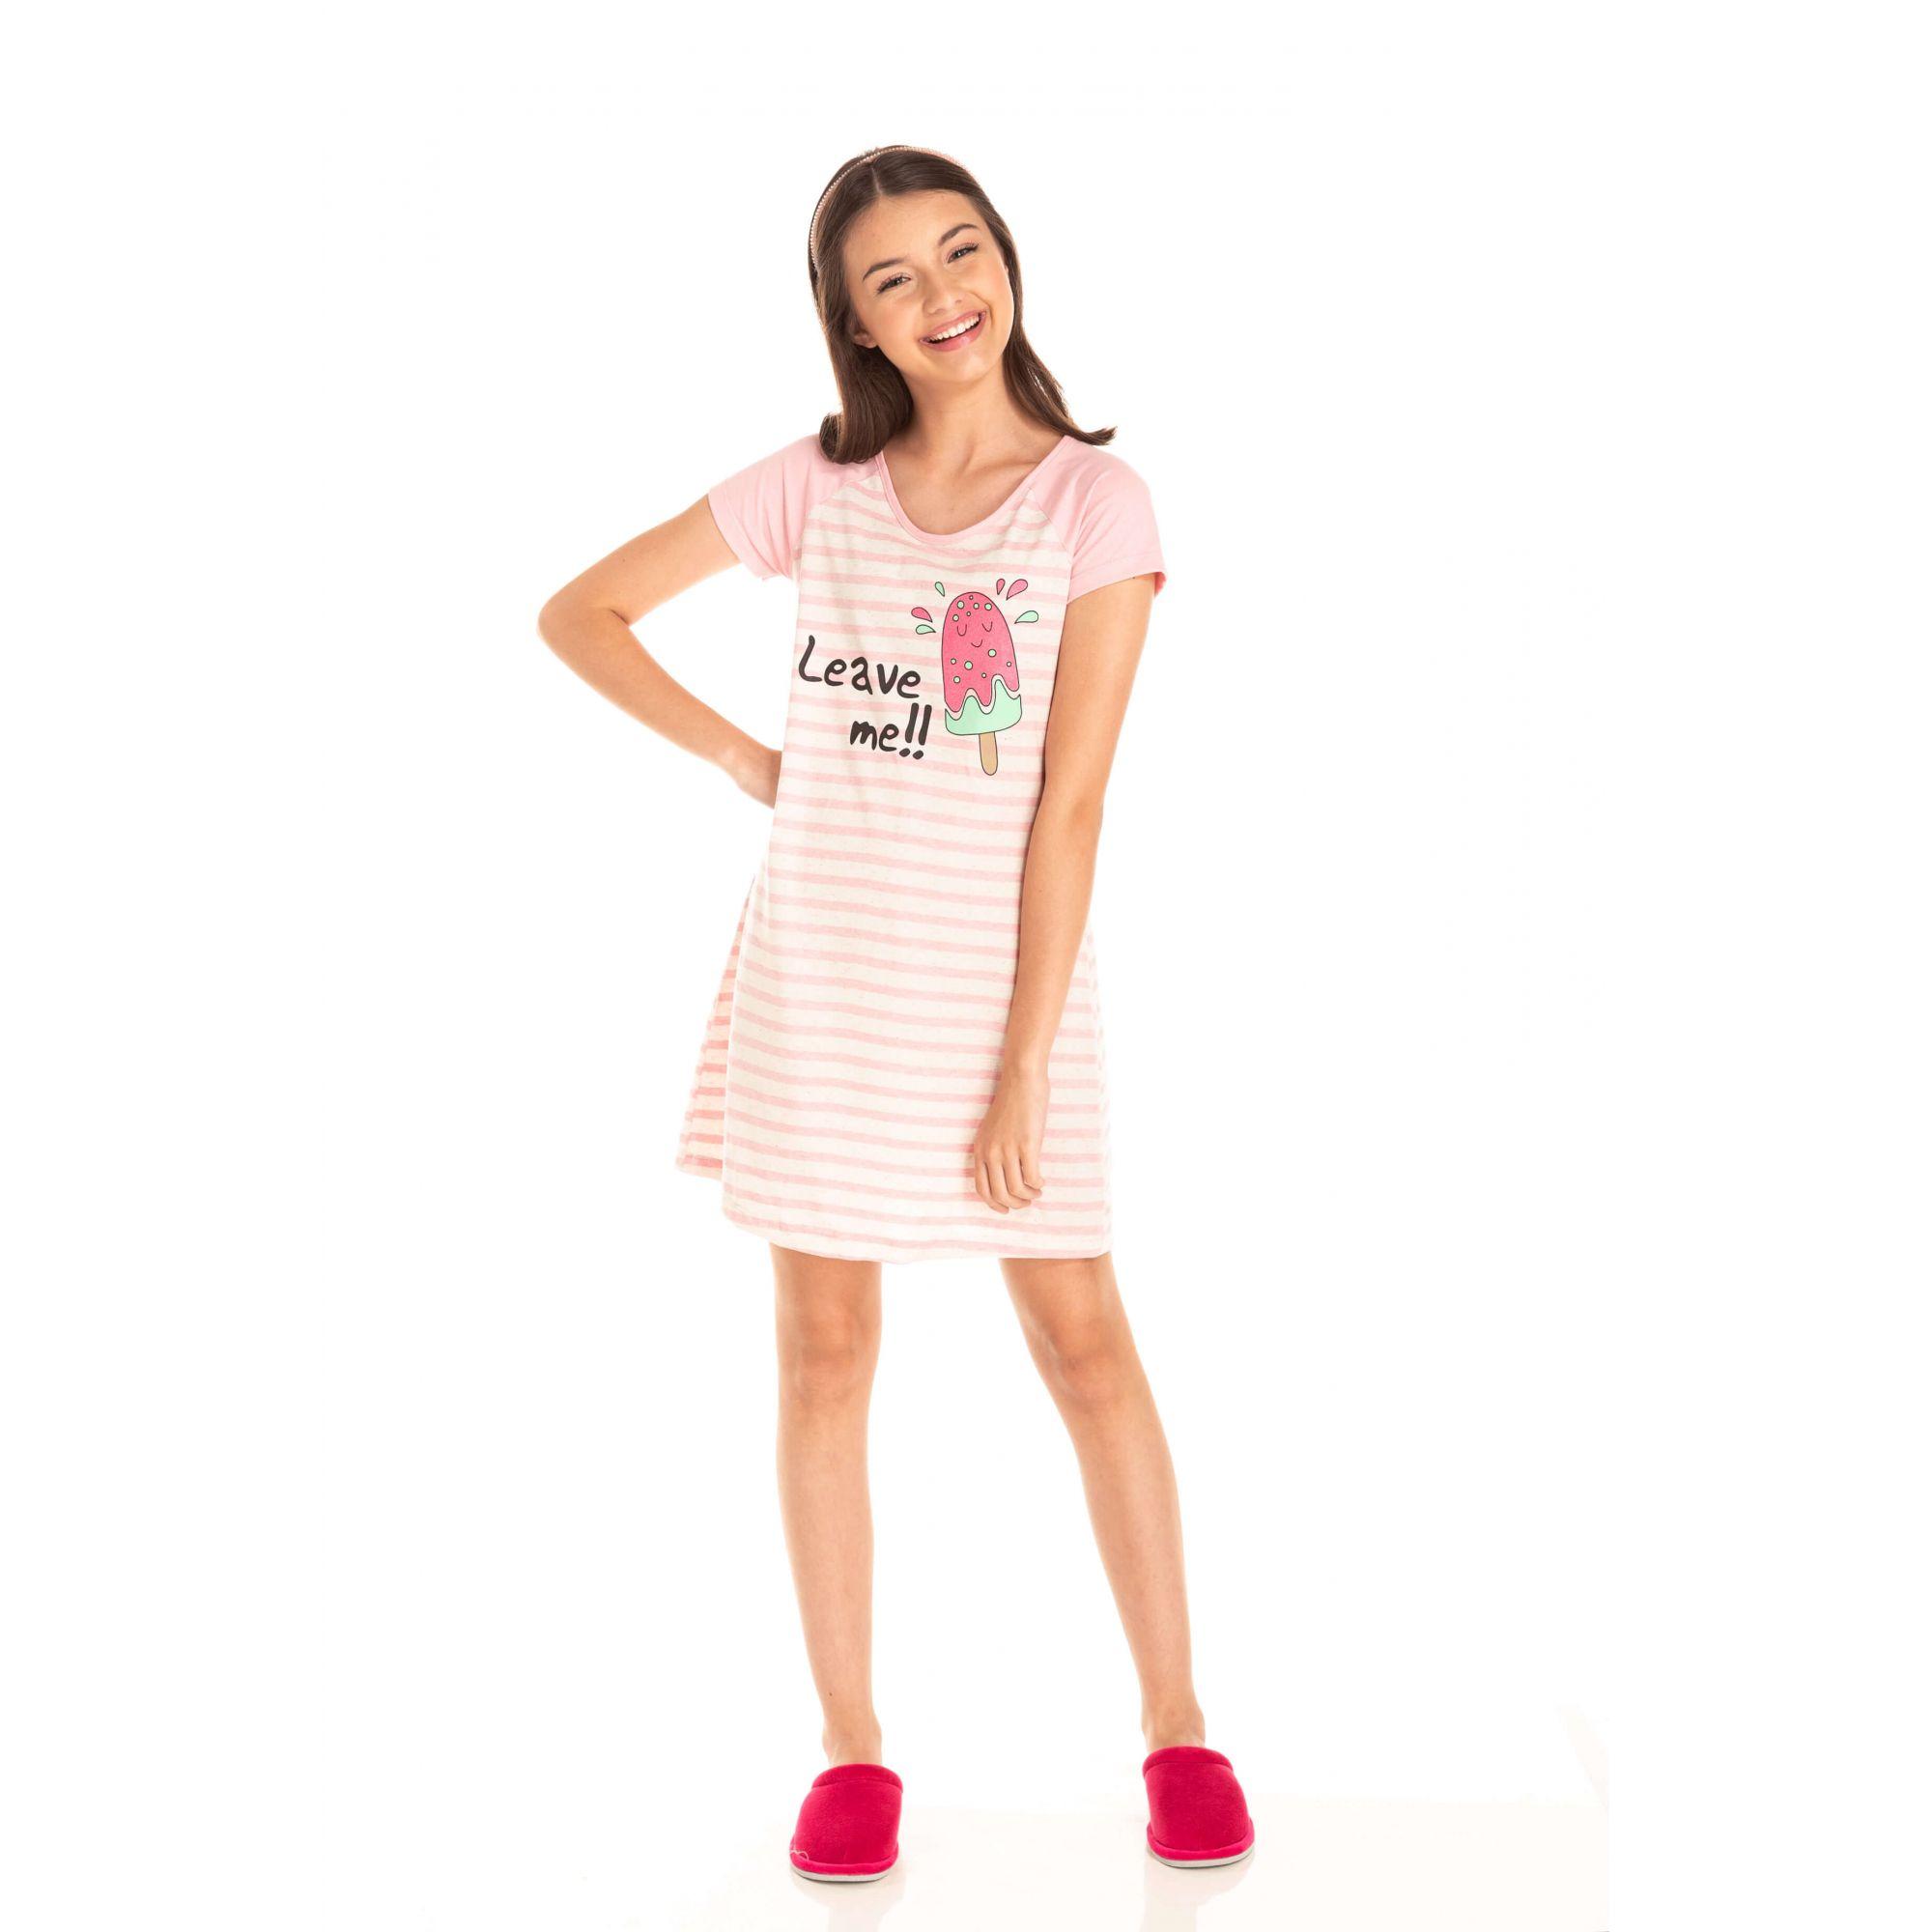 105/B - Camisola Juvenil Feminino Picolé - Rosa